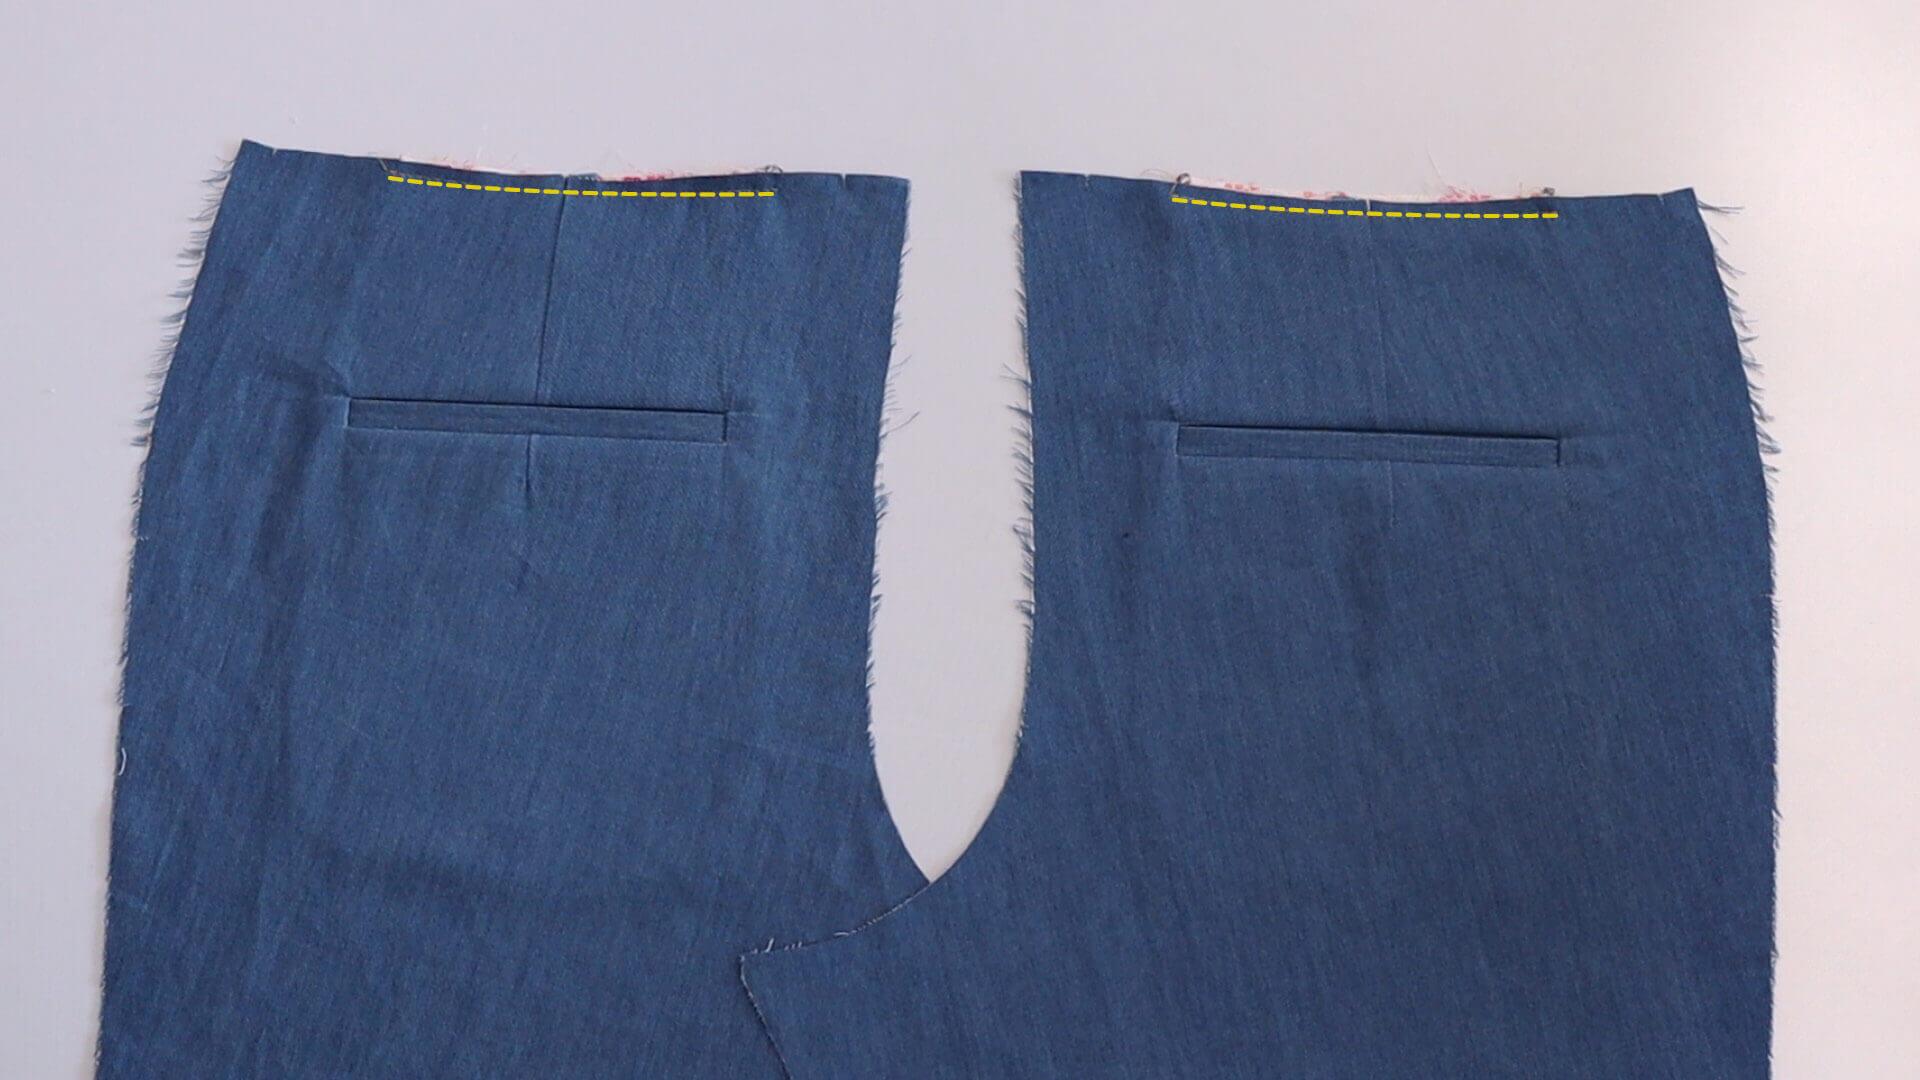 Nähanleitung einseitige Paspeltasche- Arbeitschritt: oberkante Taschenbeutel mit Hilfsnaht an Hinterhose